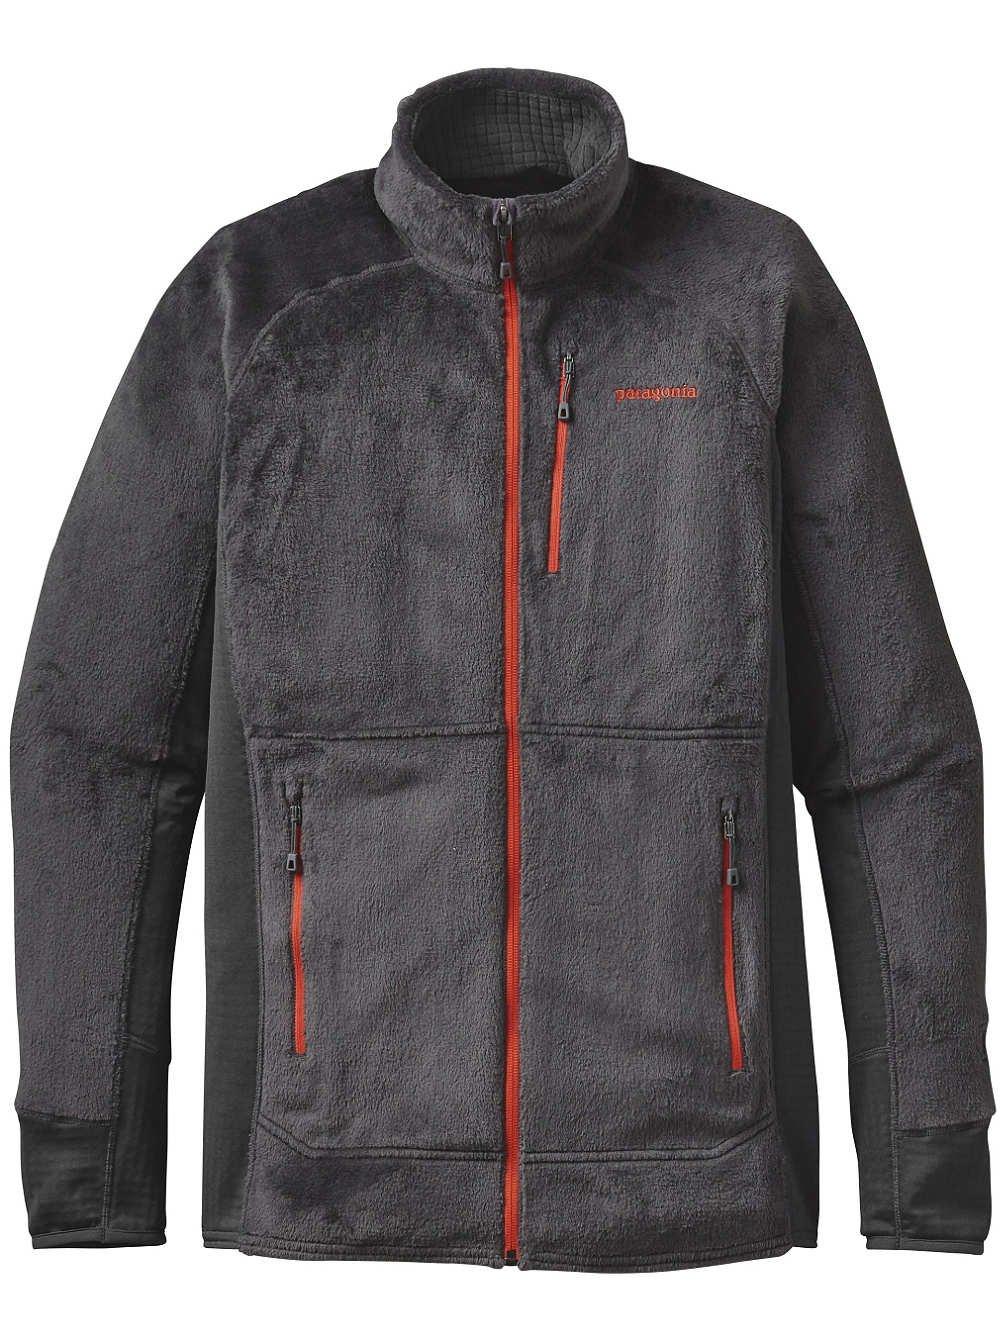 Patagoniaメンズr2ジャケット B01HBOT9MM X-Large|Forge Grey W/Cusco Orange Forge Grey W/Cusco Orange X-Large